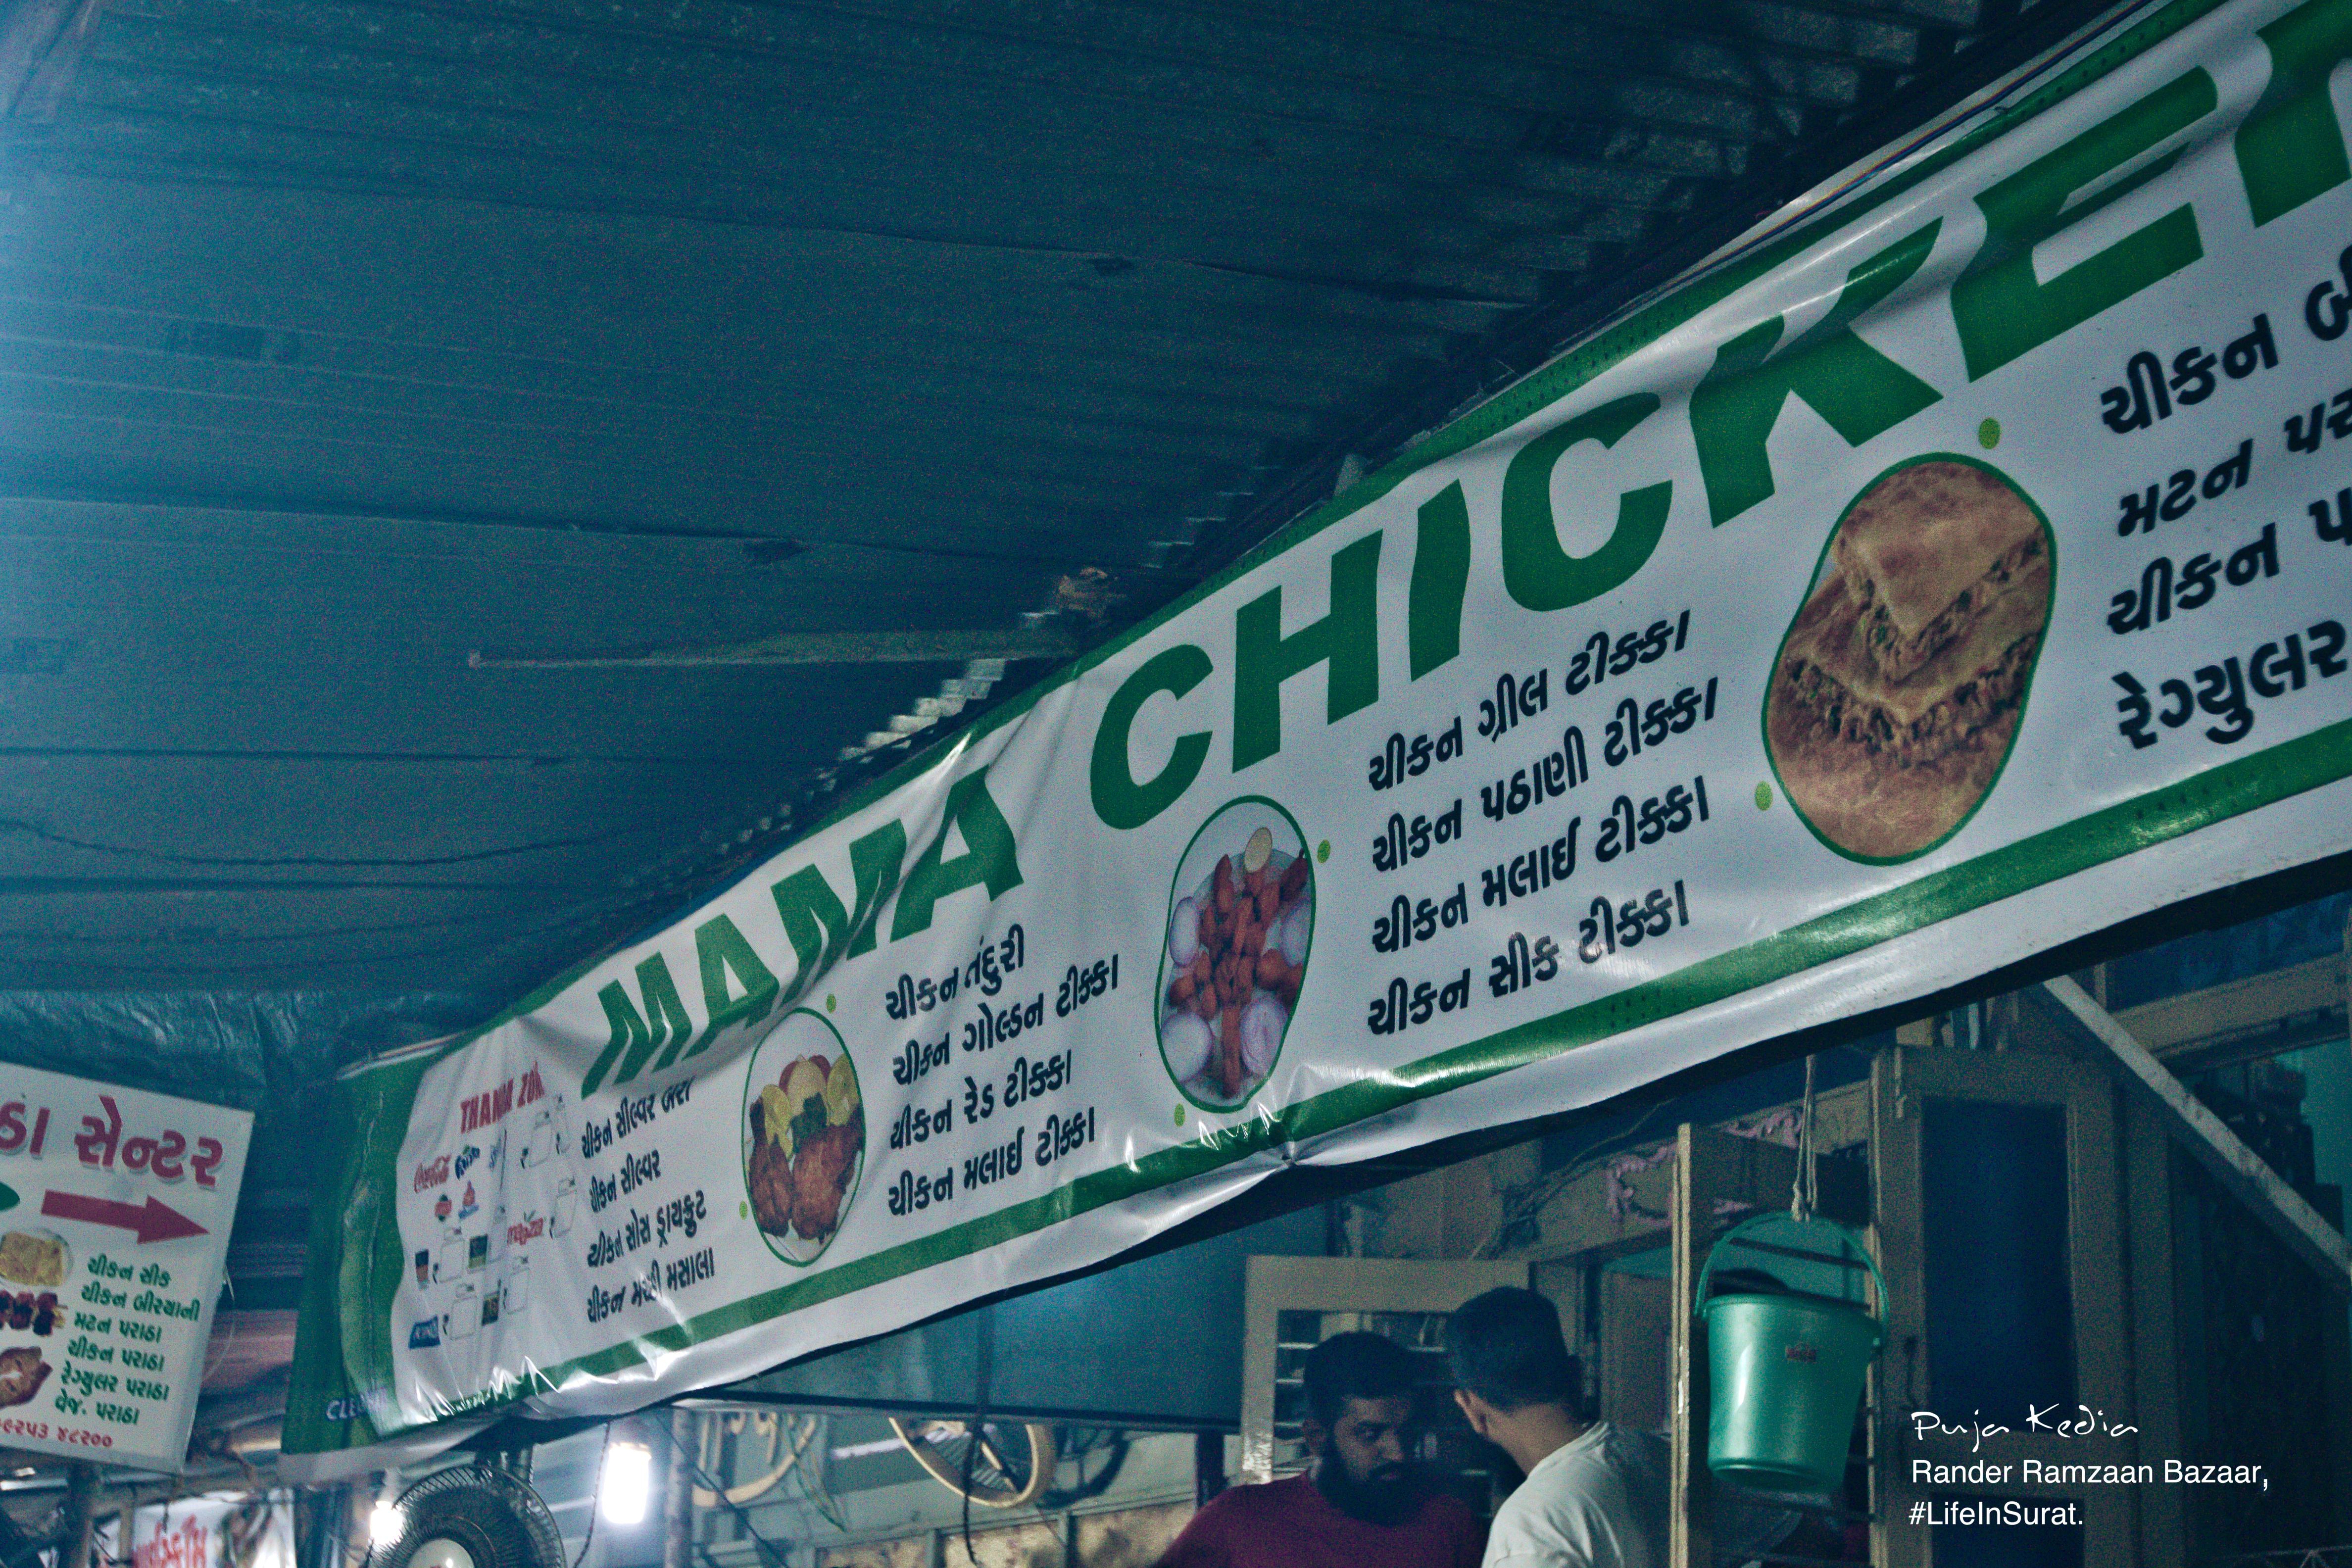 Rander Ramzaan Bazaar Mama's